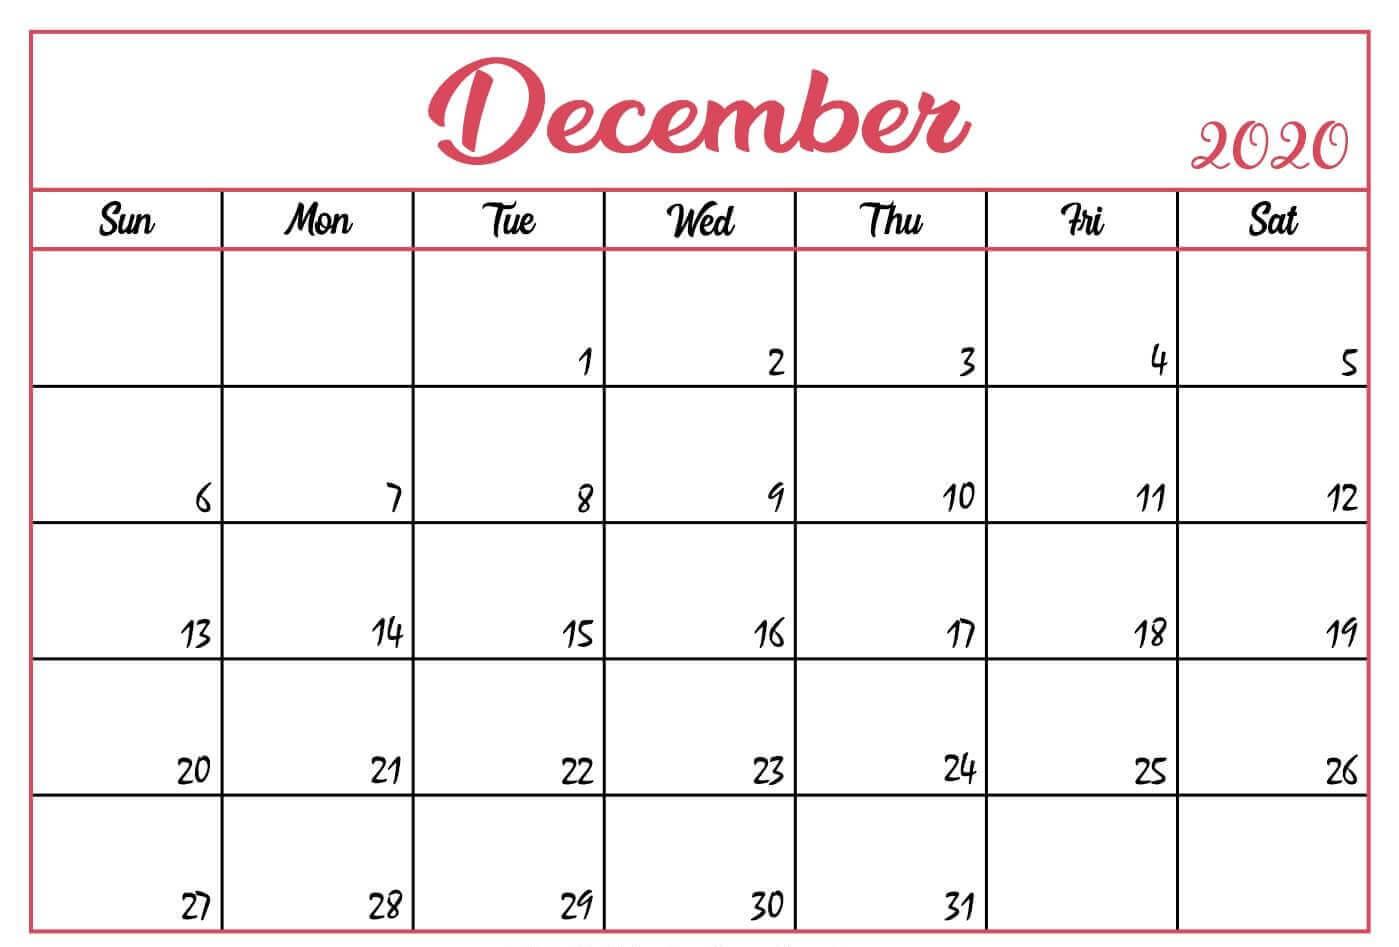 Print December 2020 Calendar Page